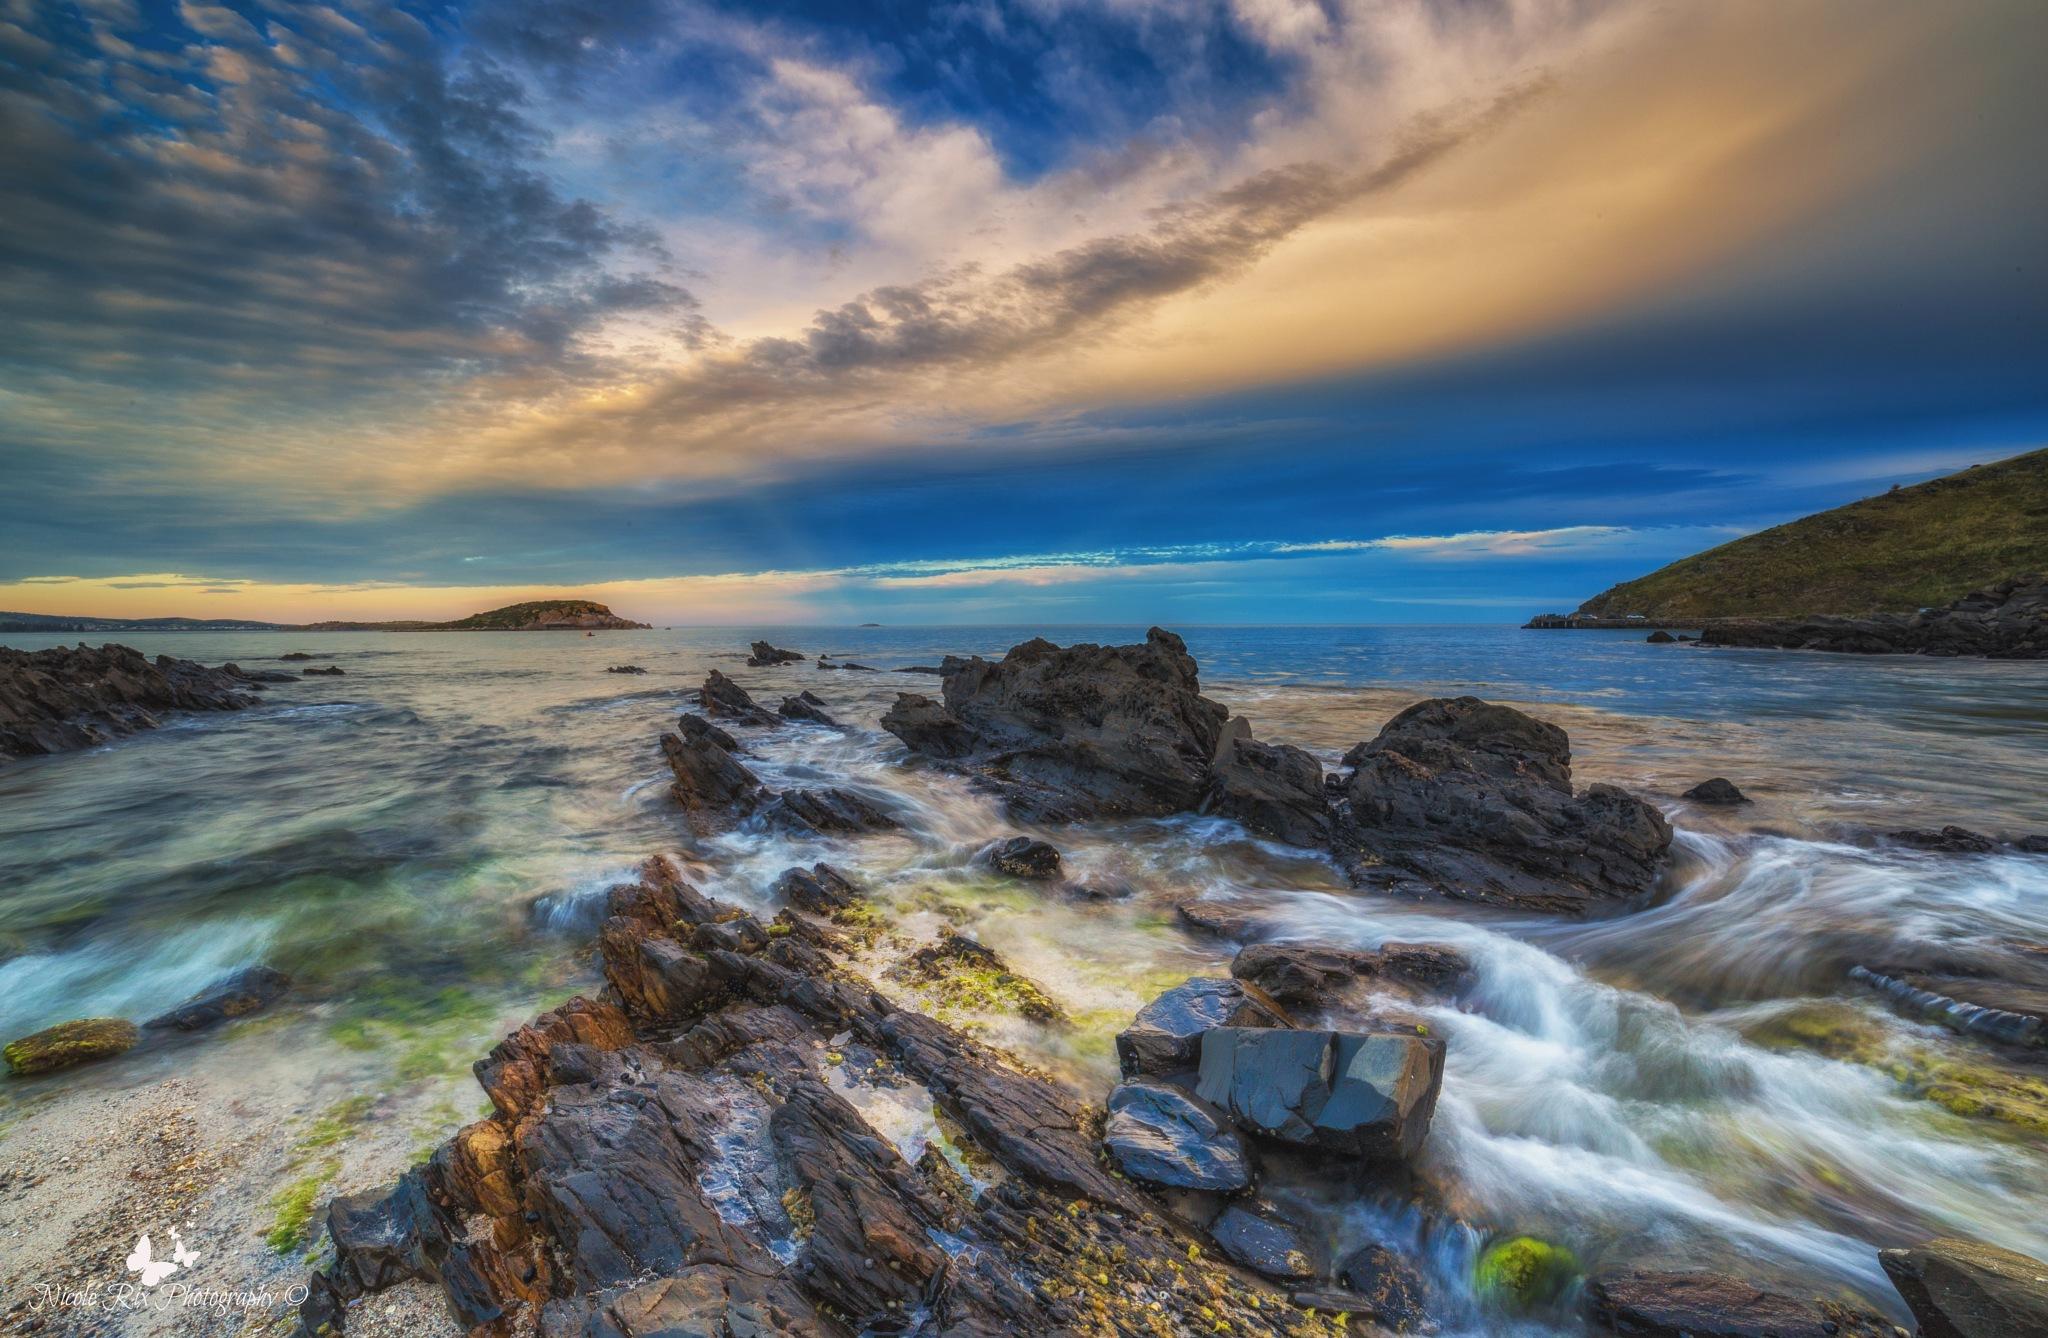 Encounter Bay view by Nicole Rix